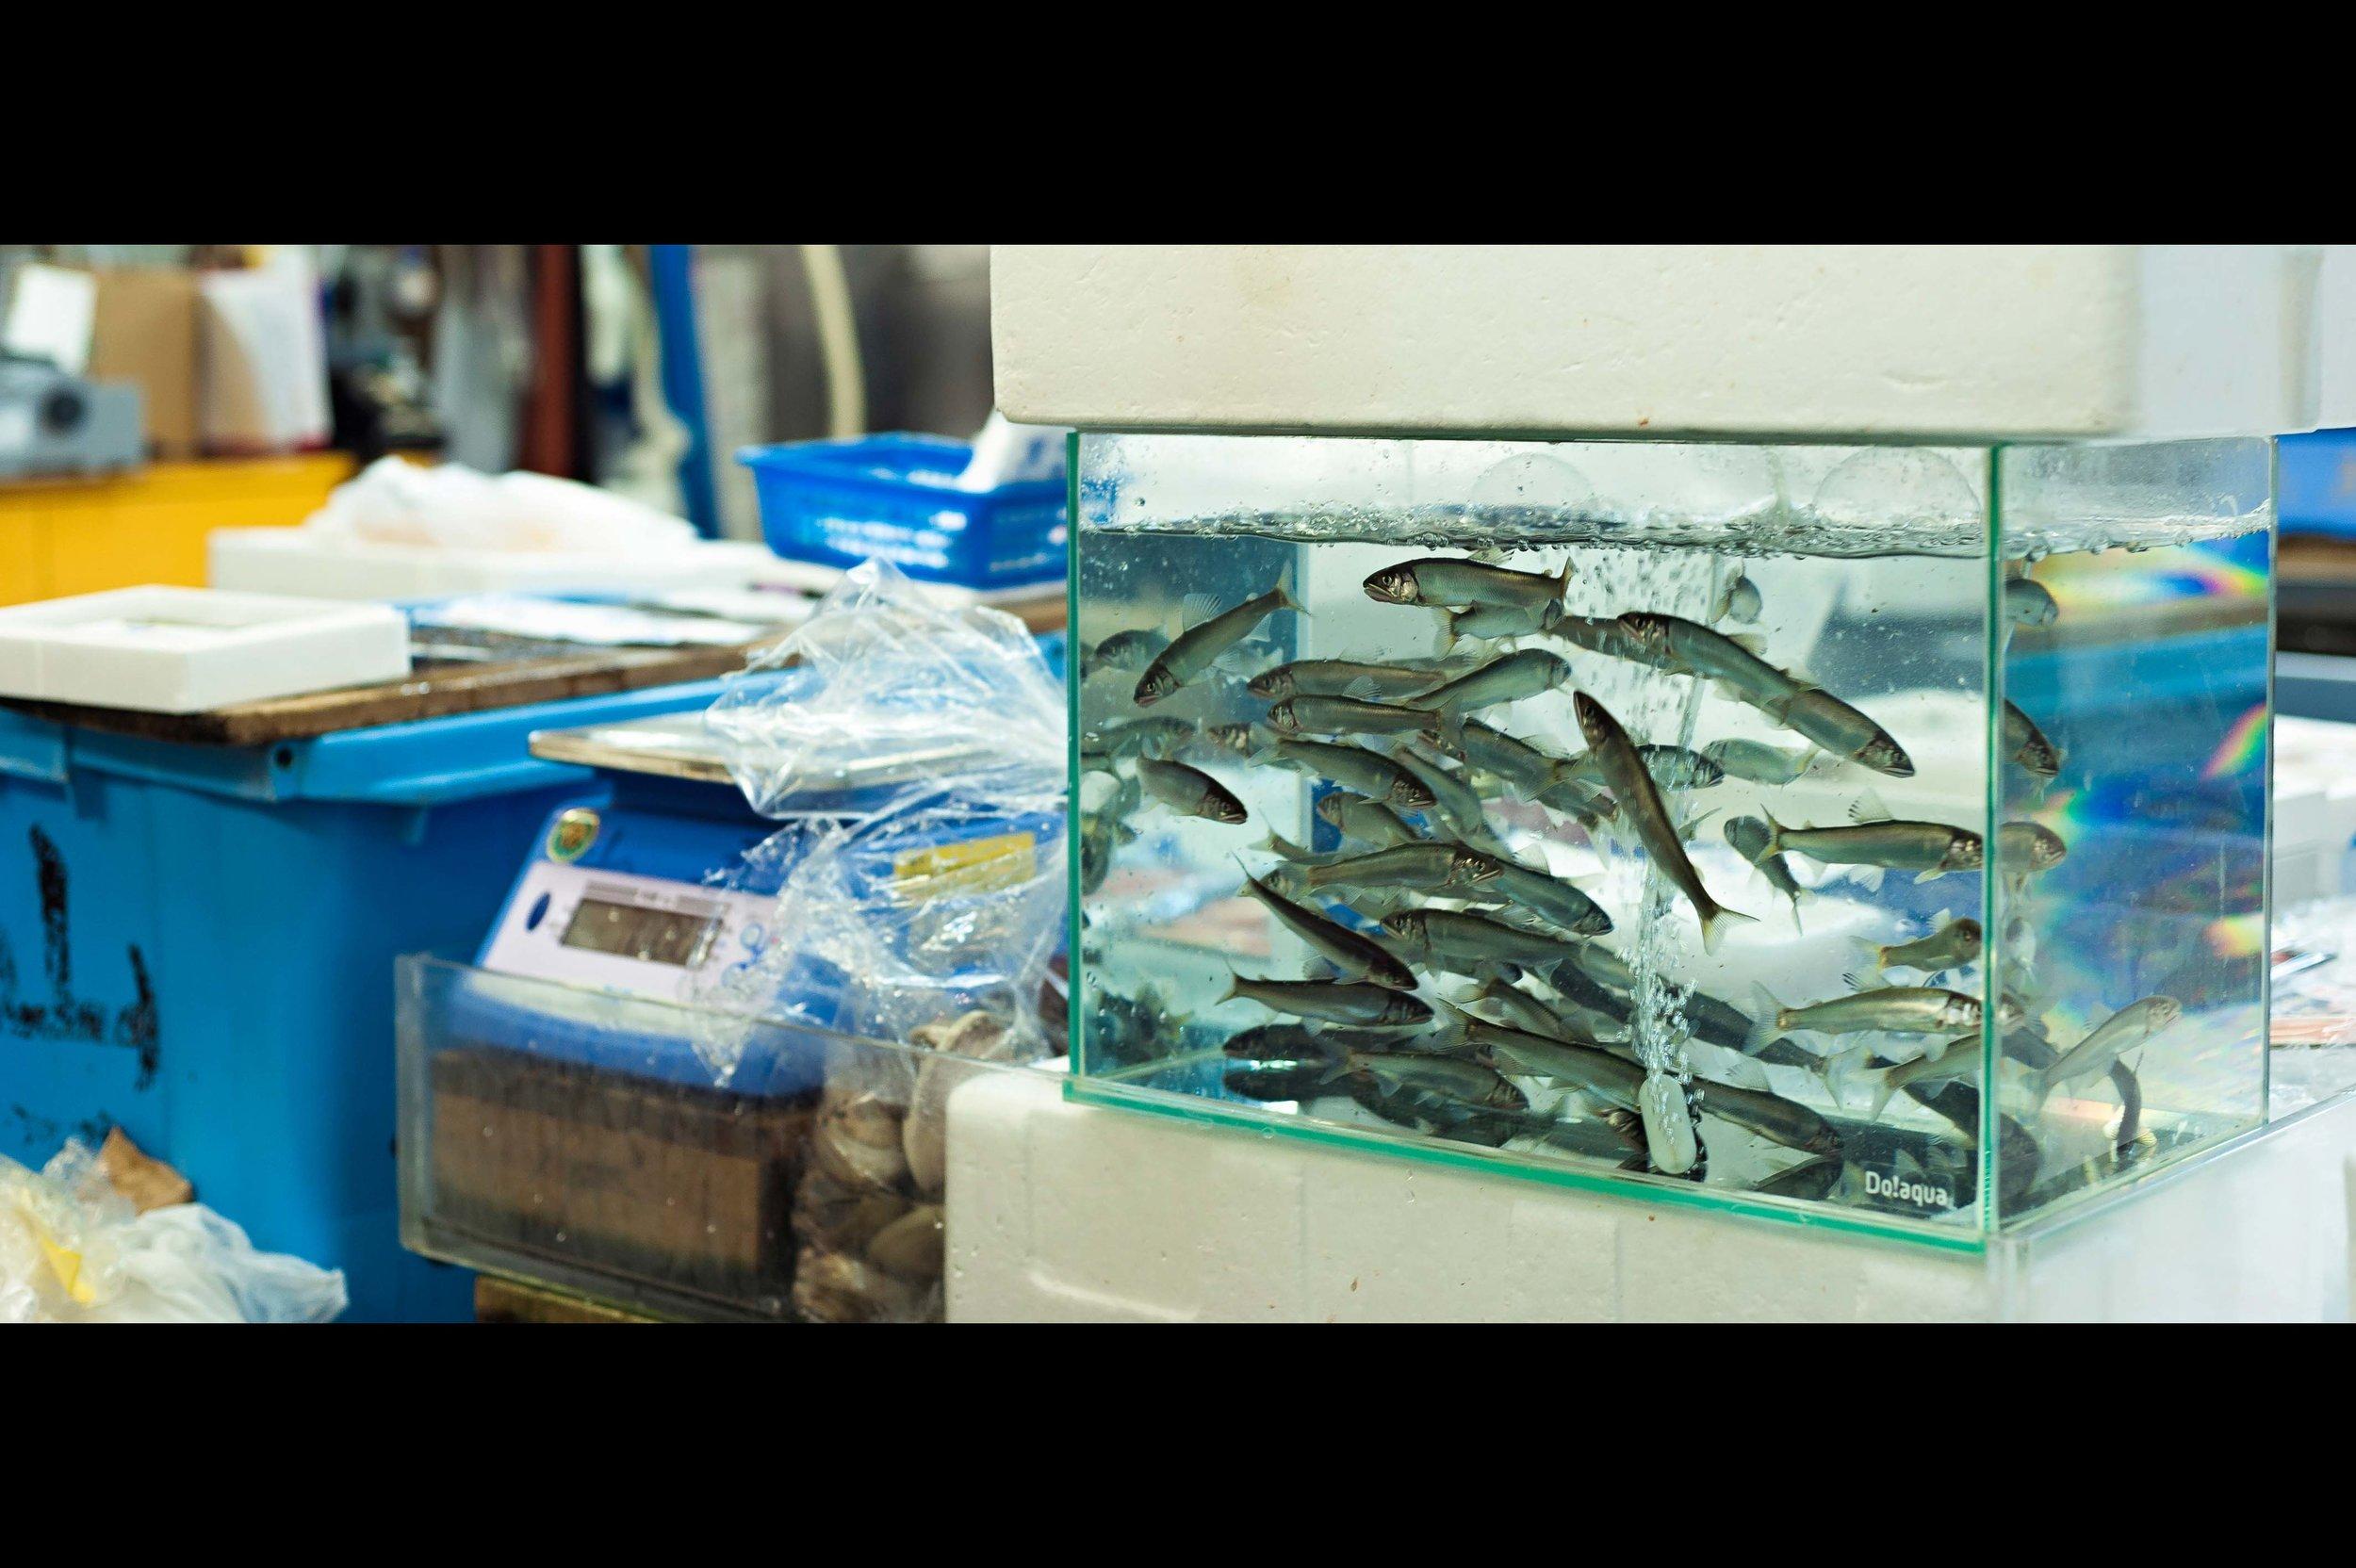 baby-salmon-tank-fish-market.jpg